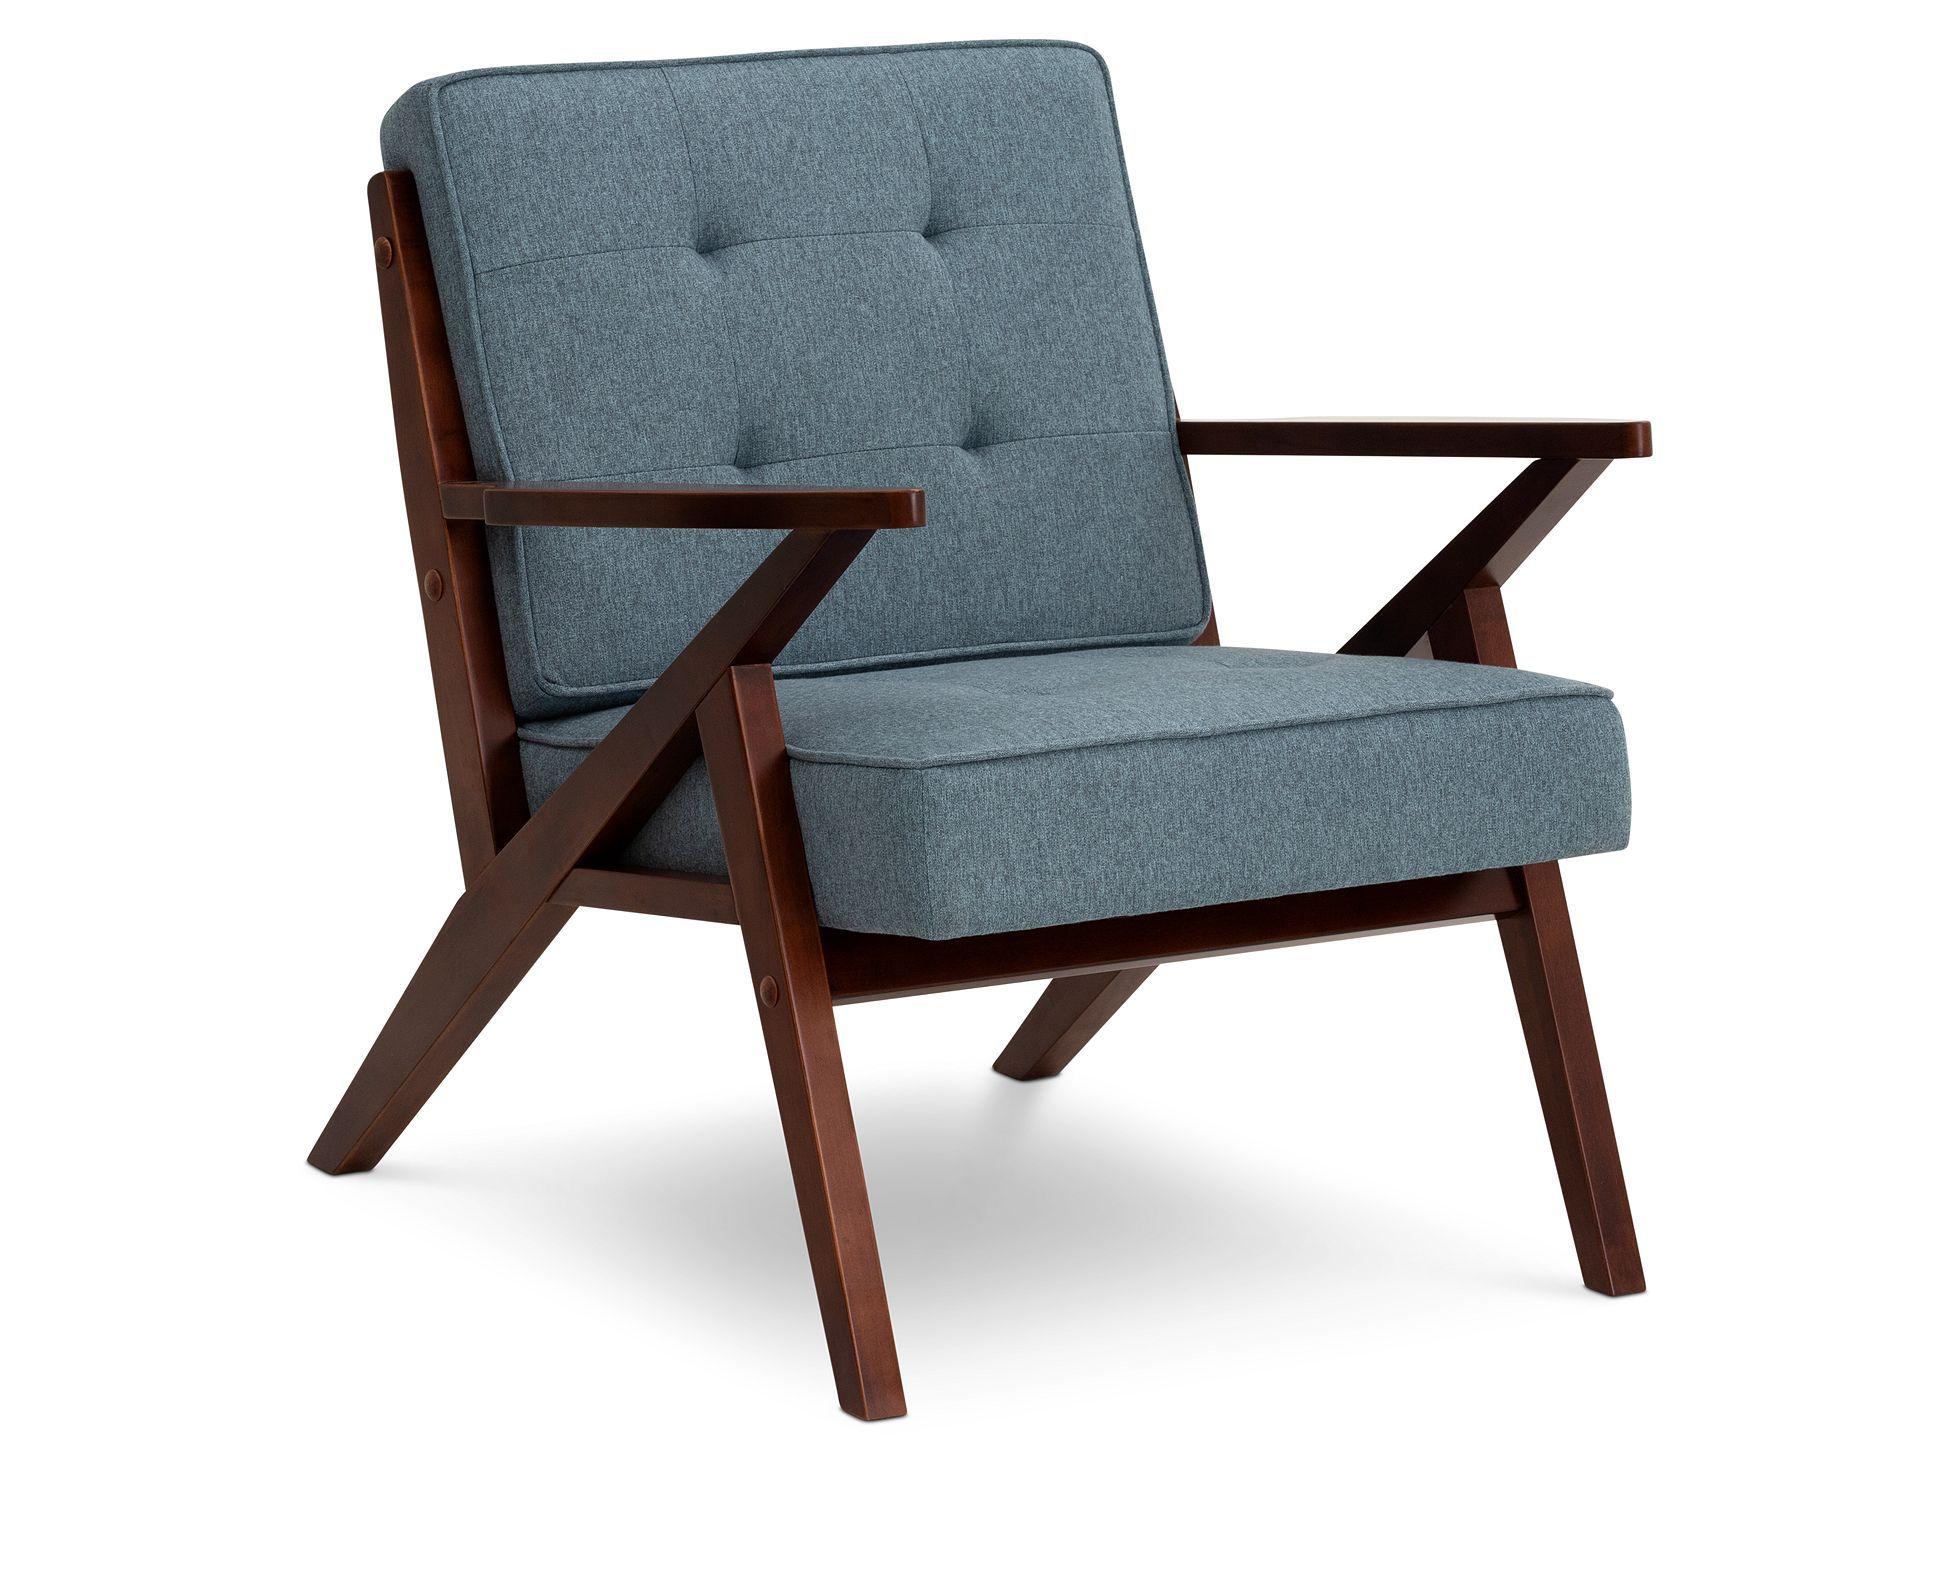 Borchardt 22 Armchair Furniture Upholstery Armchair Chair